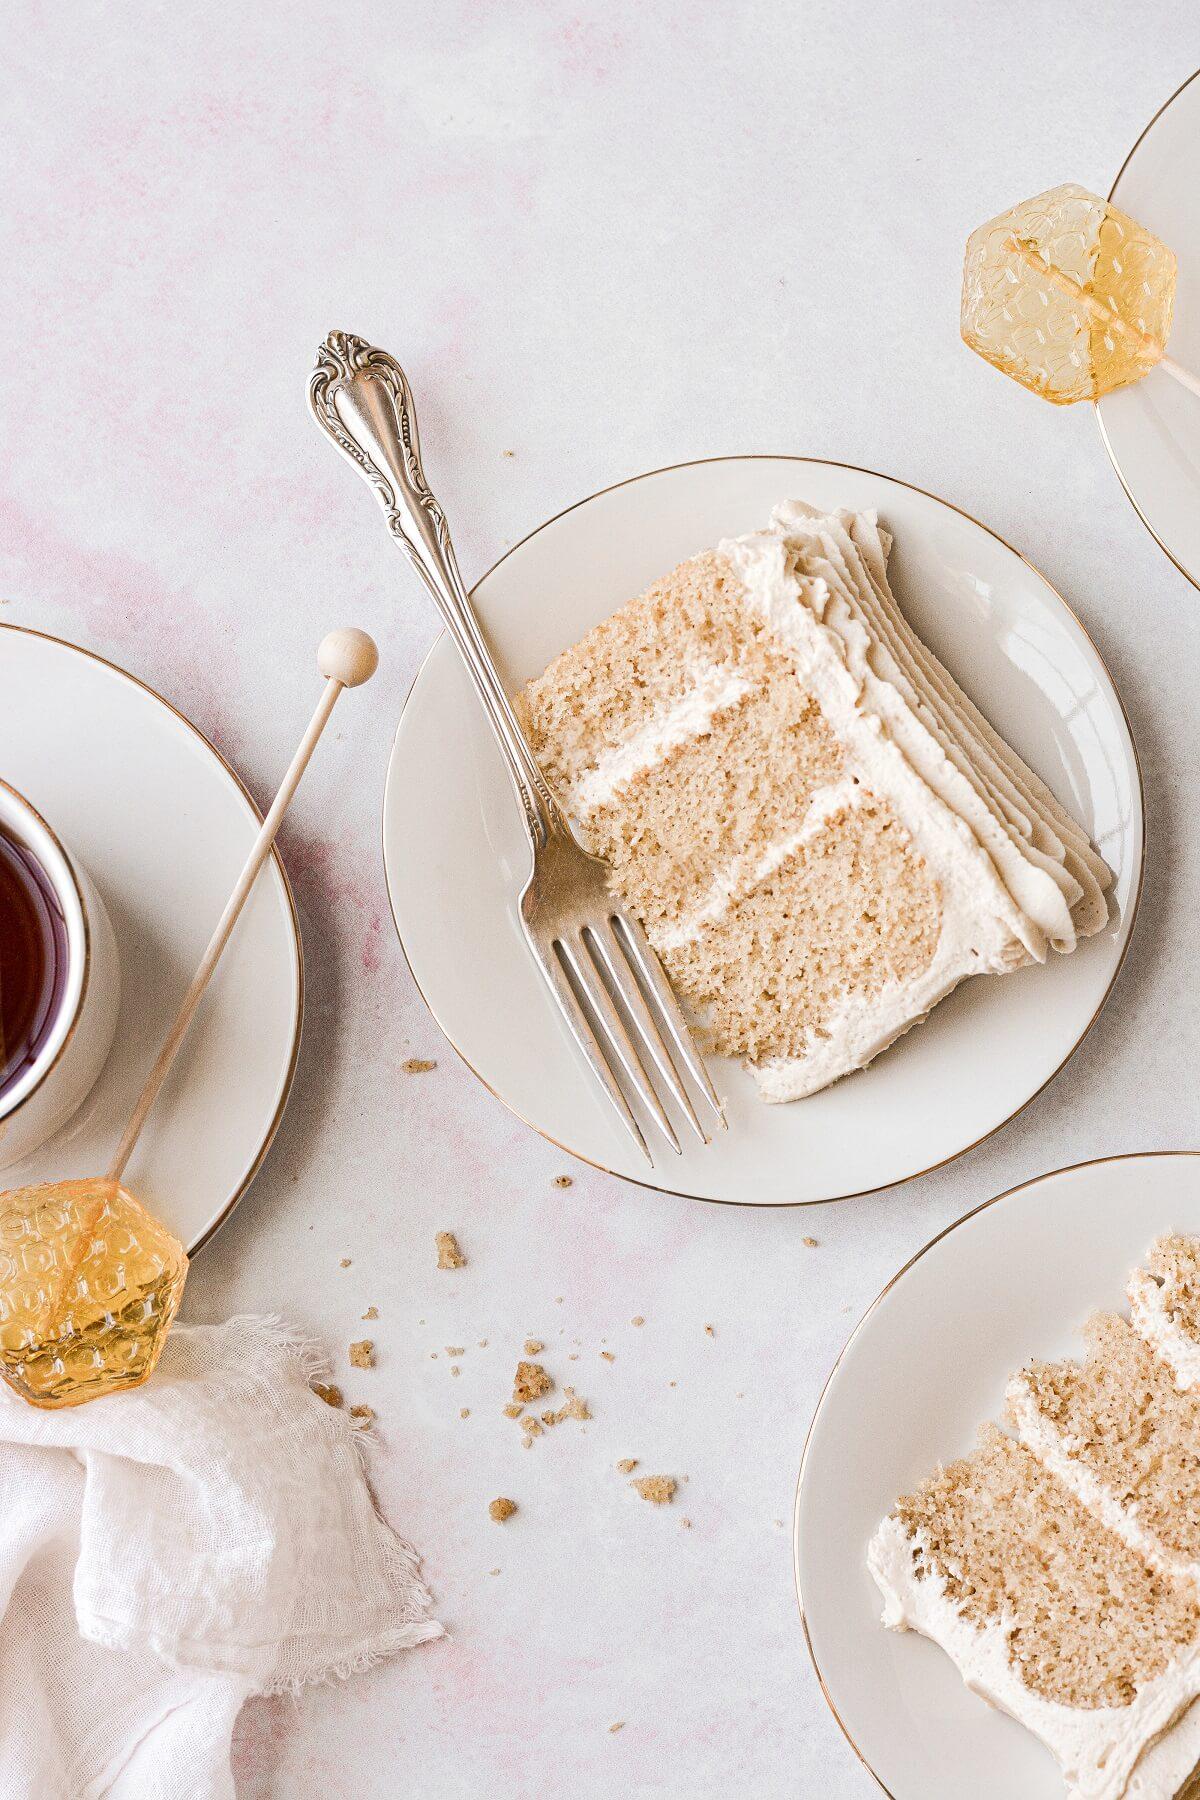 Slices of chai tea spice cake, next to cups of tea and honey stir sticks.